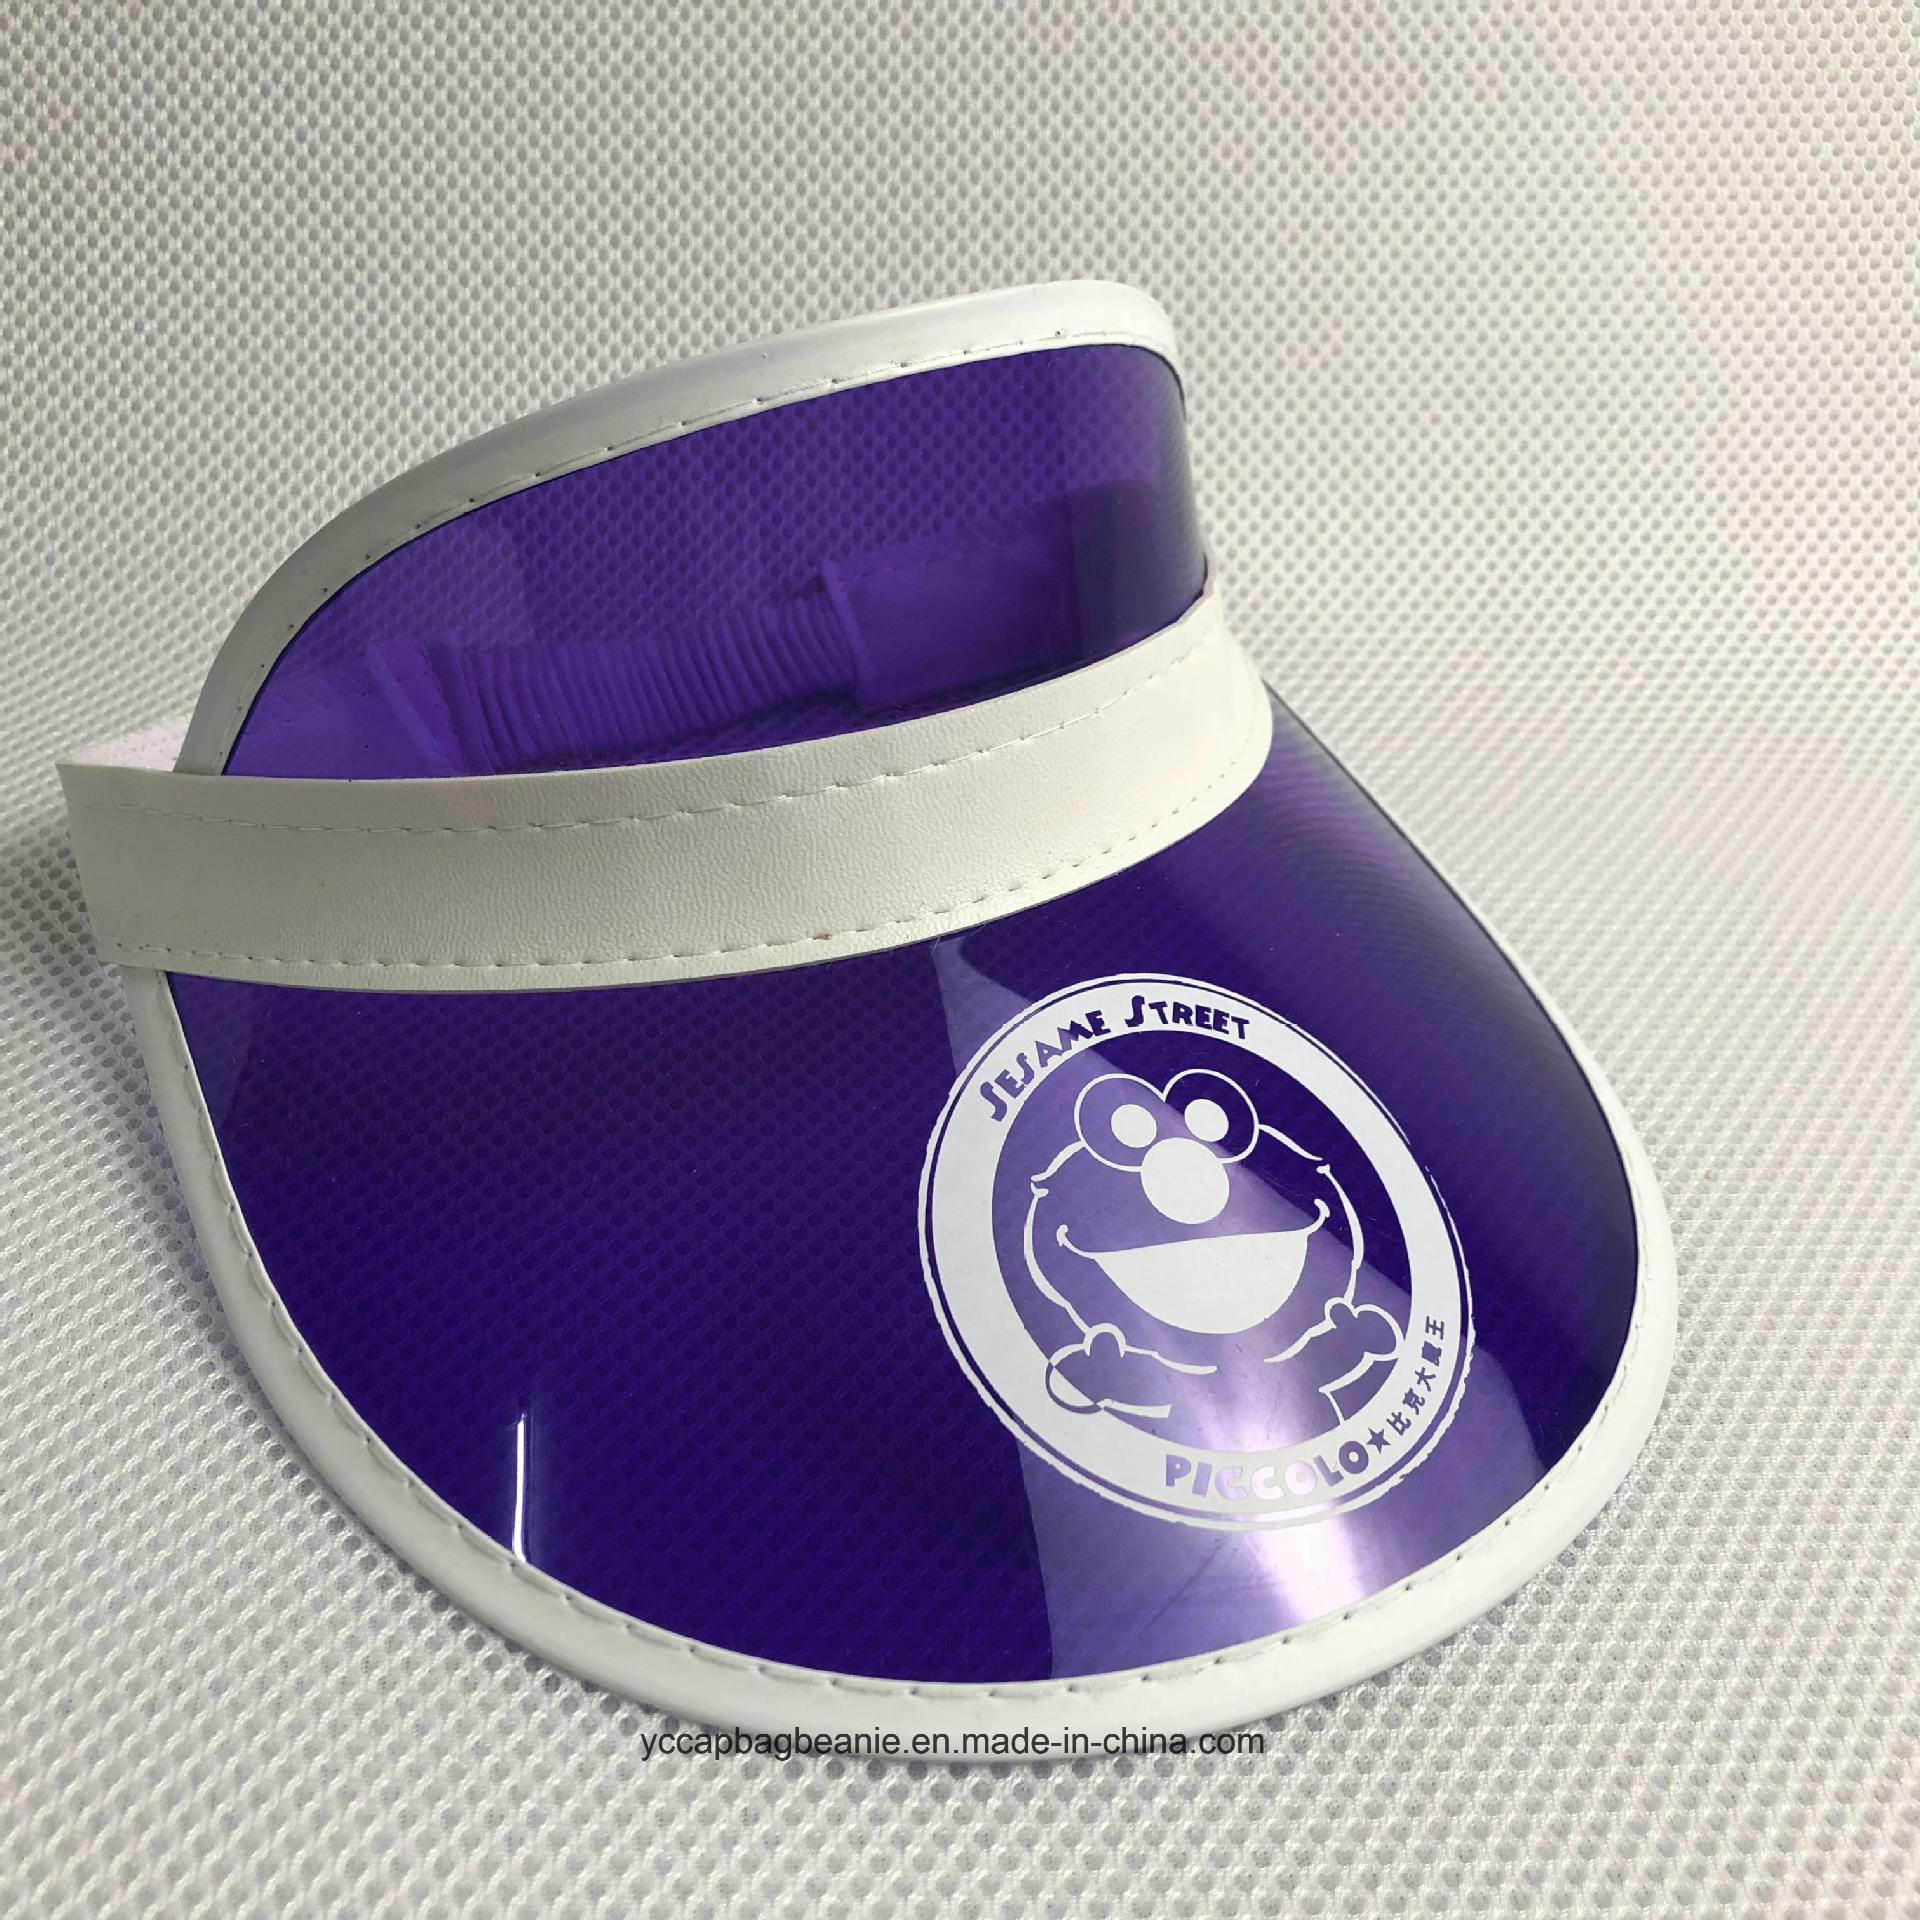 25776c7a8434d China Popular Promotional Plastic PVC Sun Visor Hat Photos ...